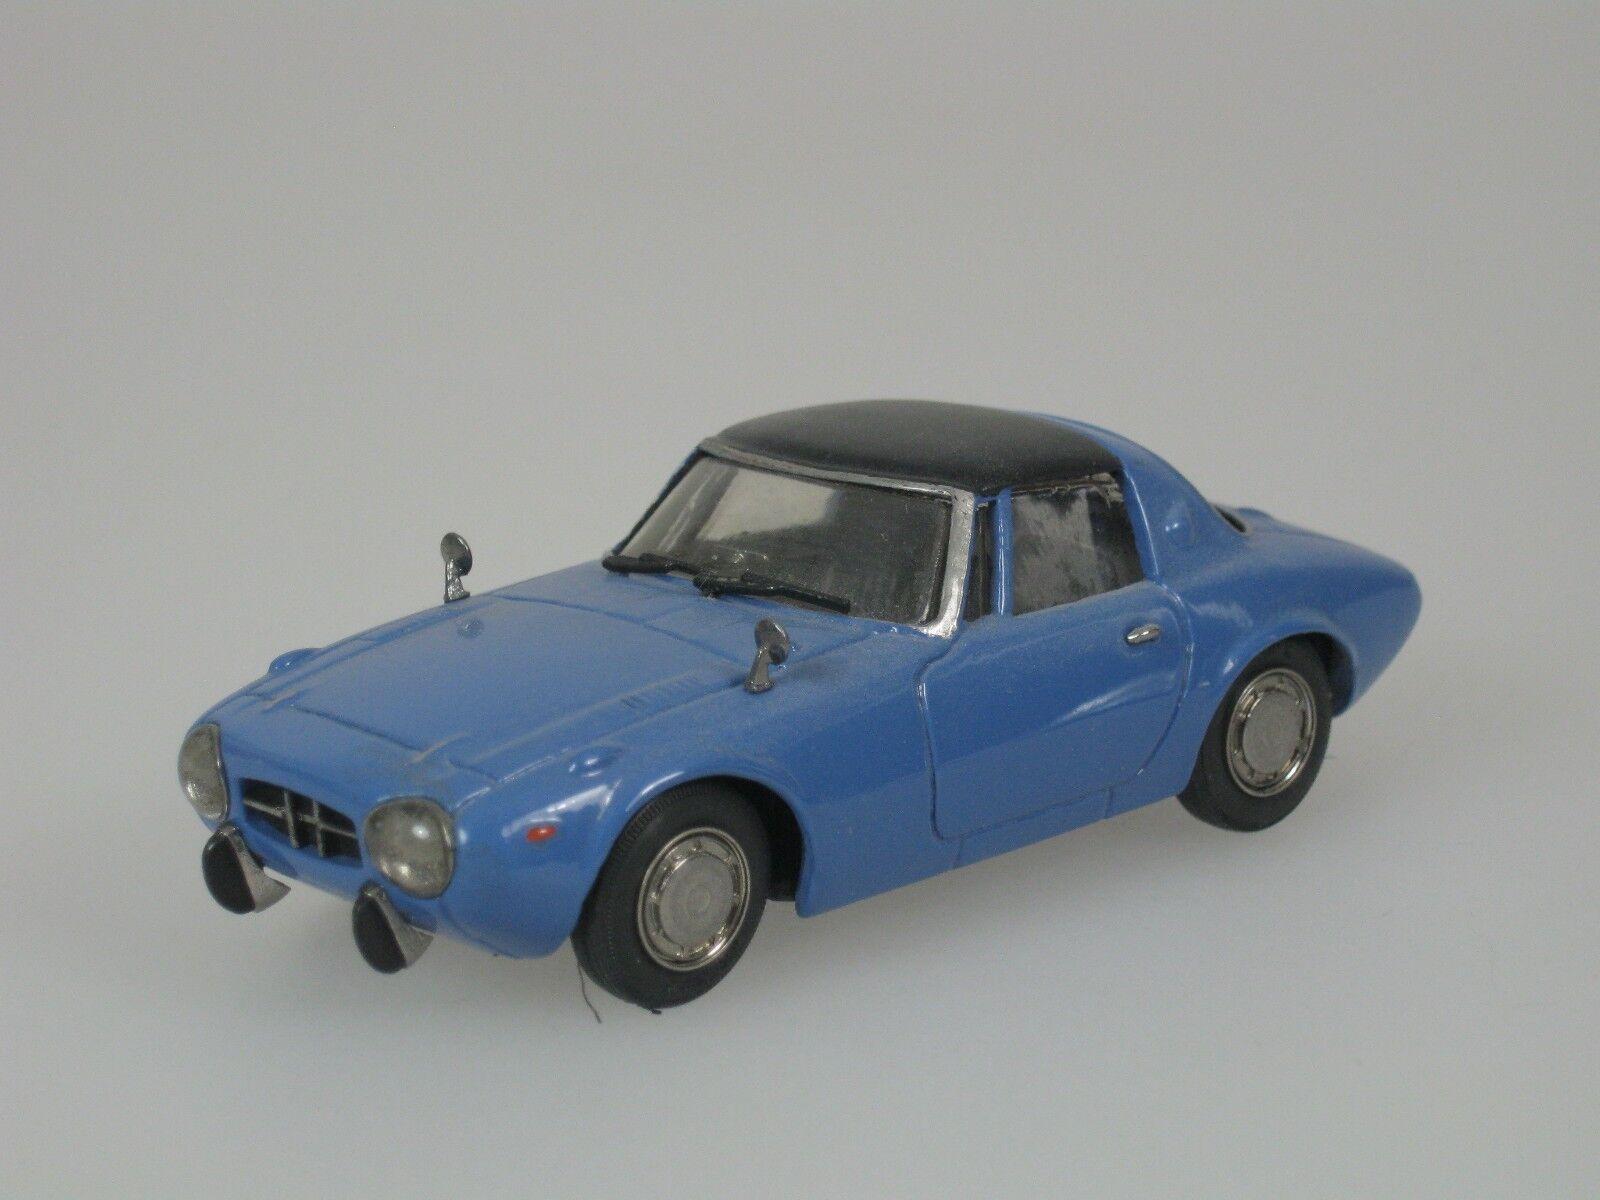 Toyota Sports 800 s800 1964 azul Factory built 1 43 Newcon 2 nuevo muy raras